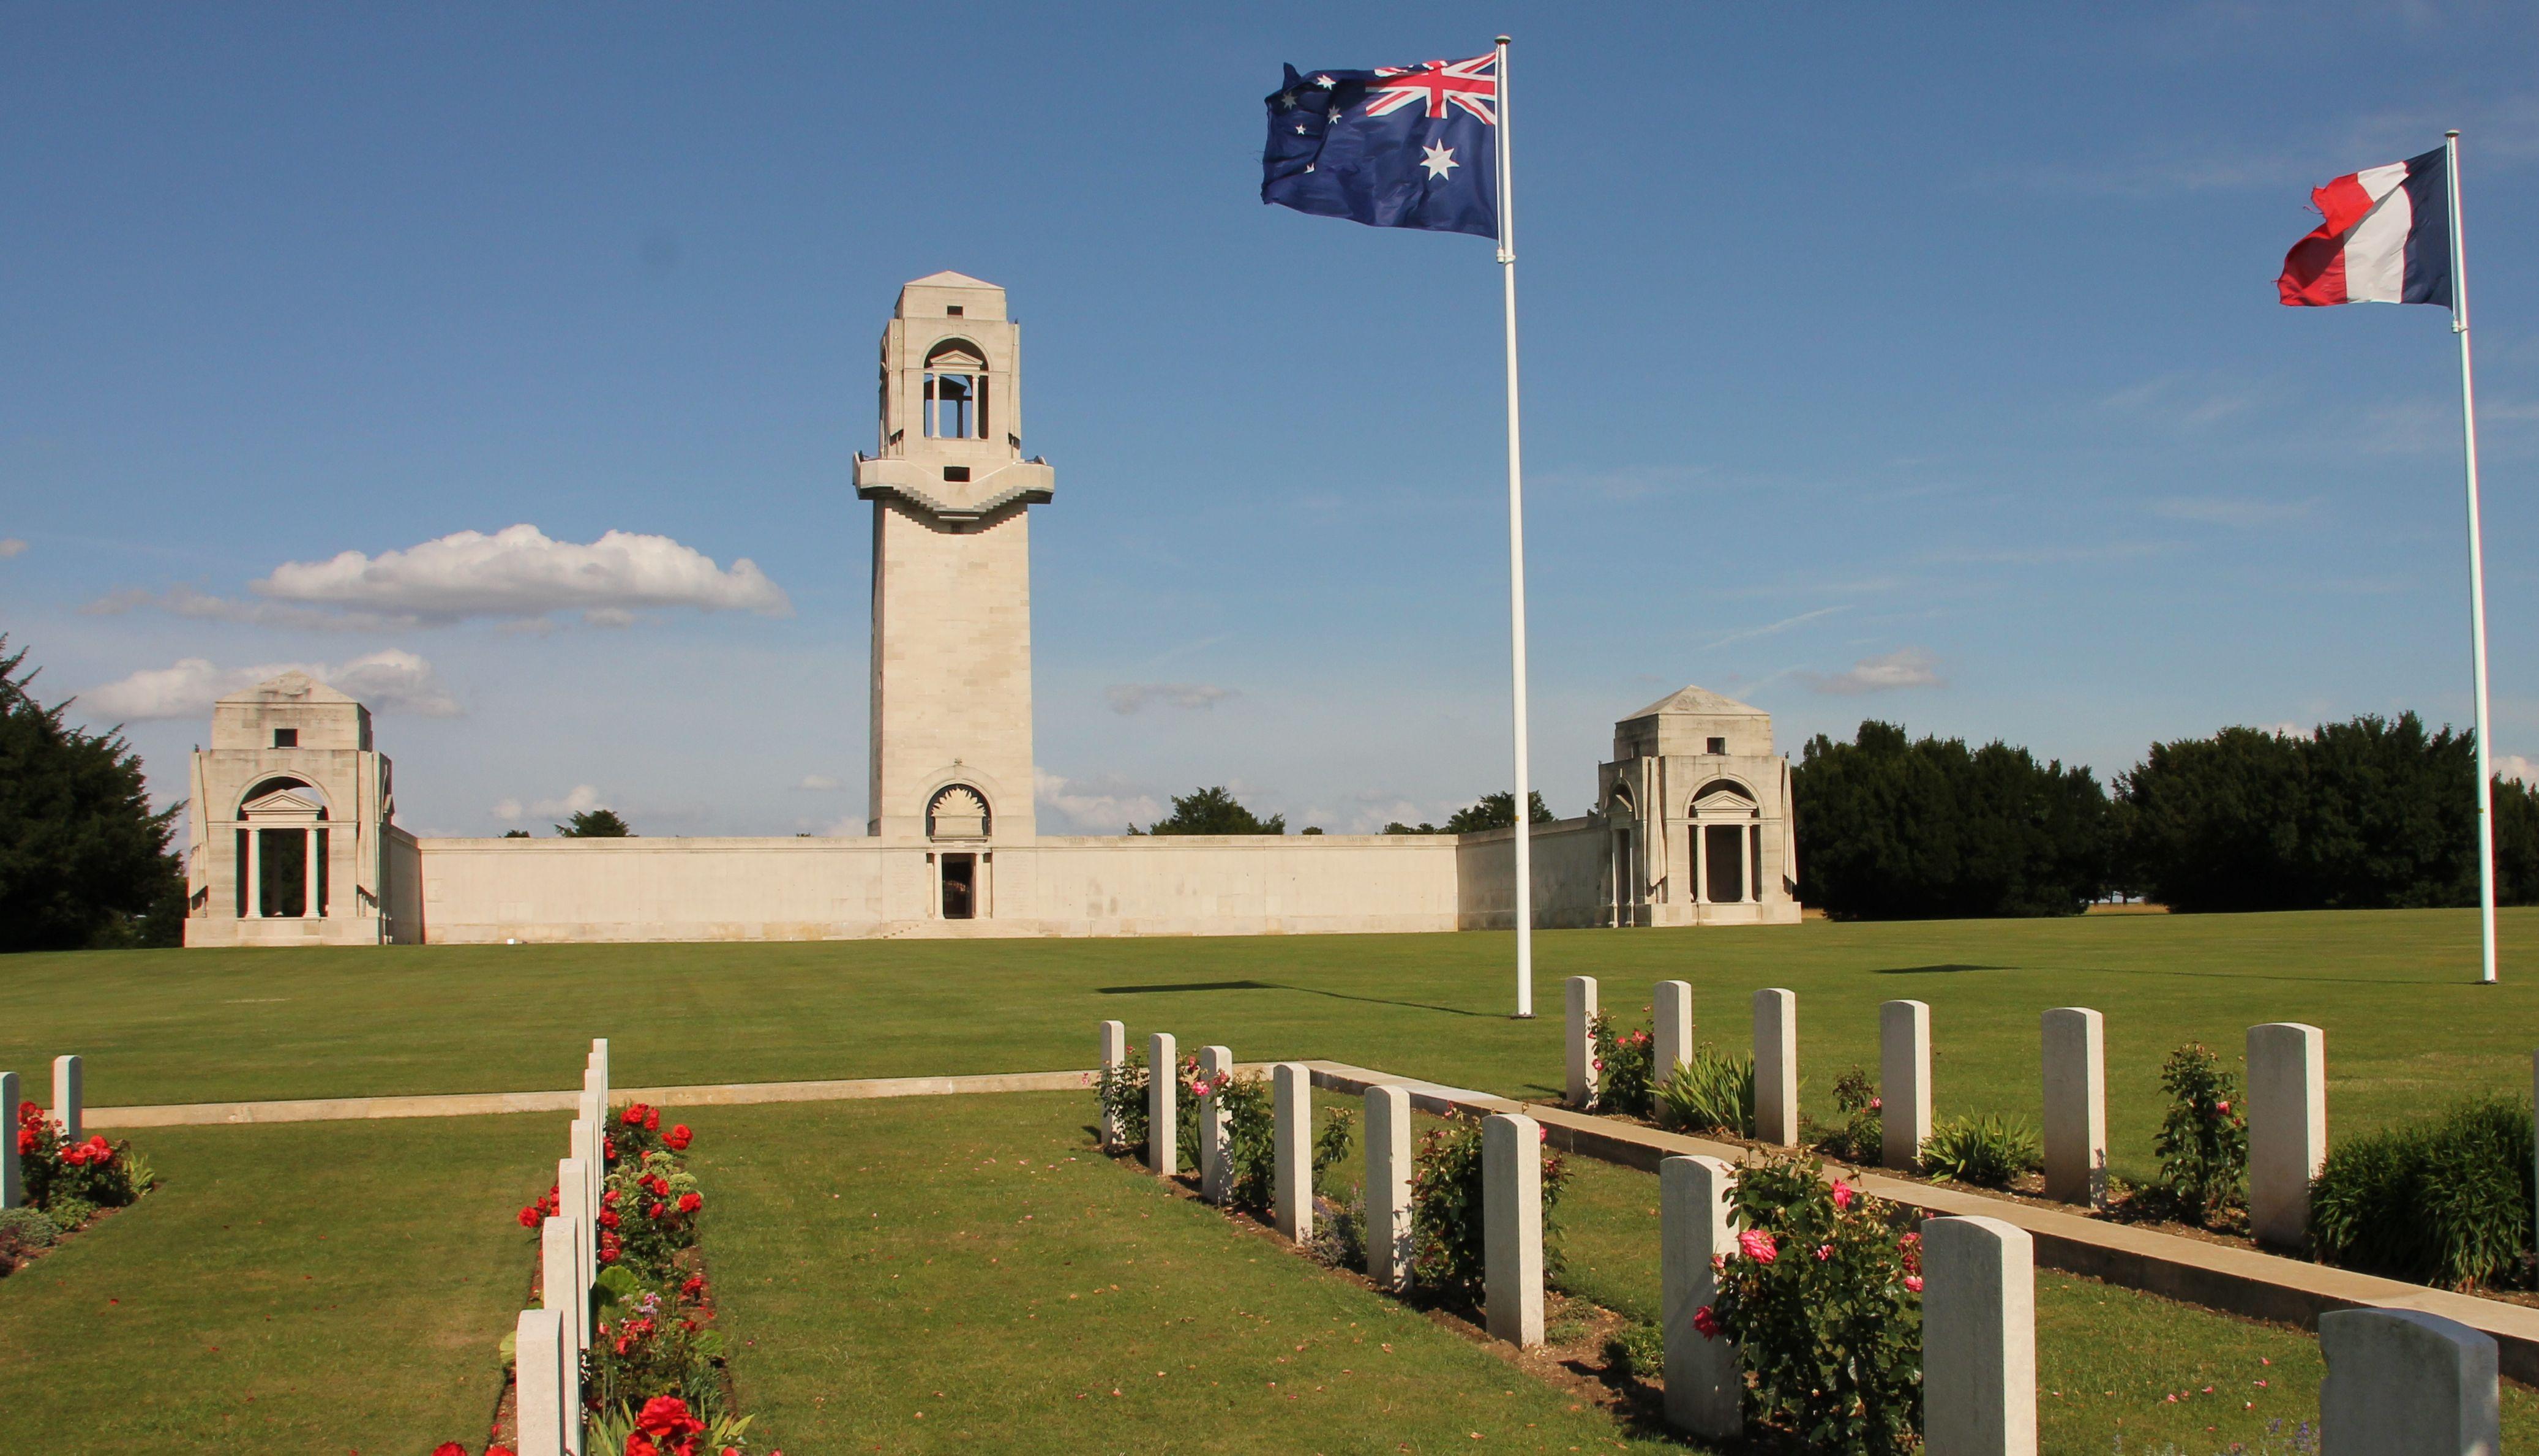 Somme Battlefields Memorial